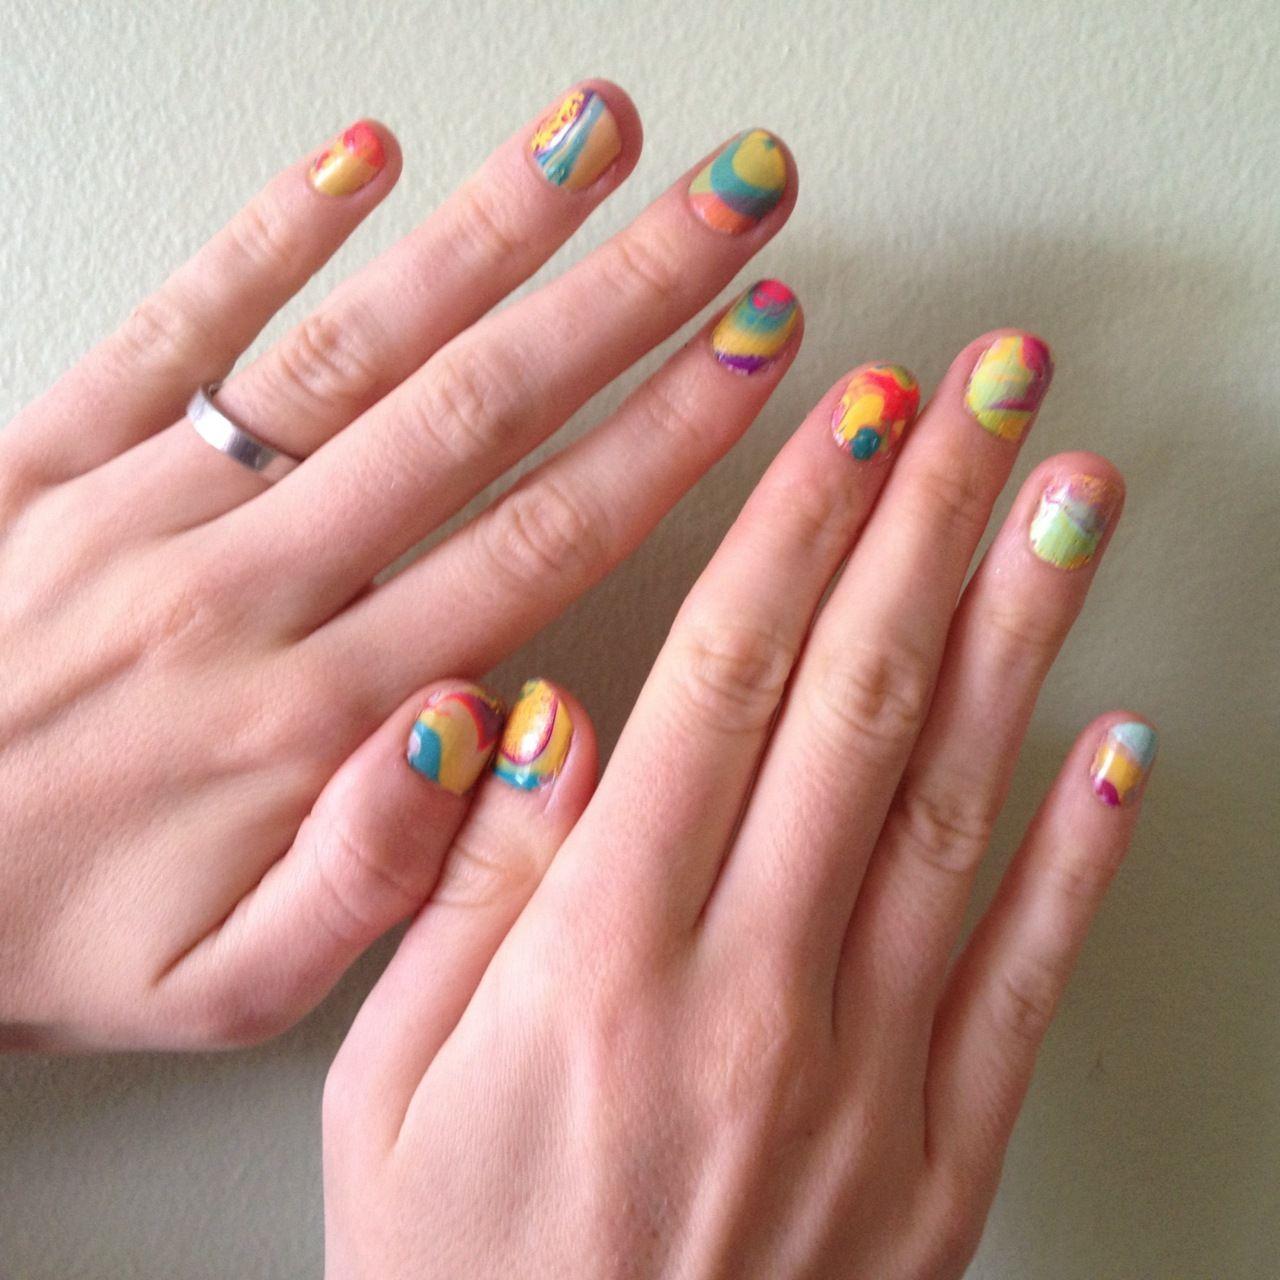 Tie dye nails emi pinterest tie dye nails pastel nails and makeup